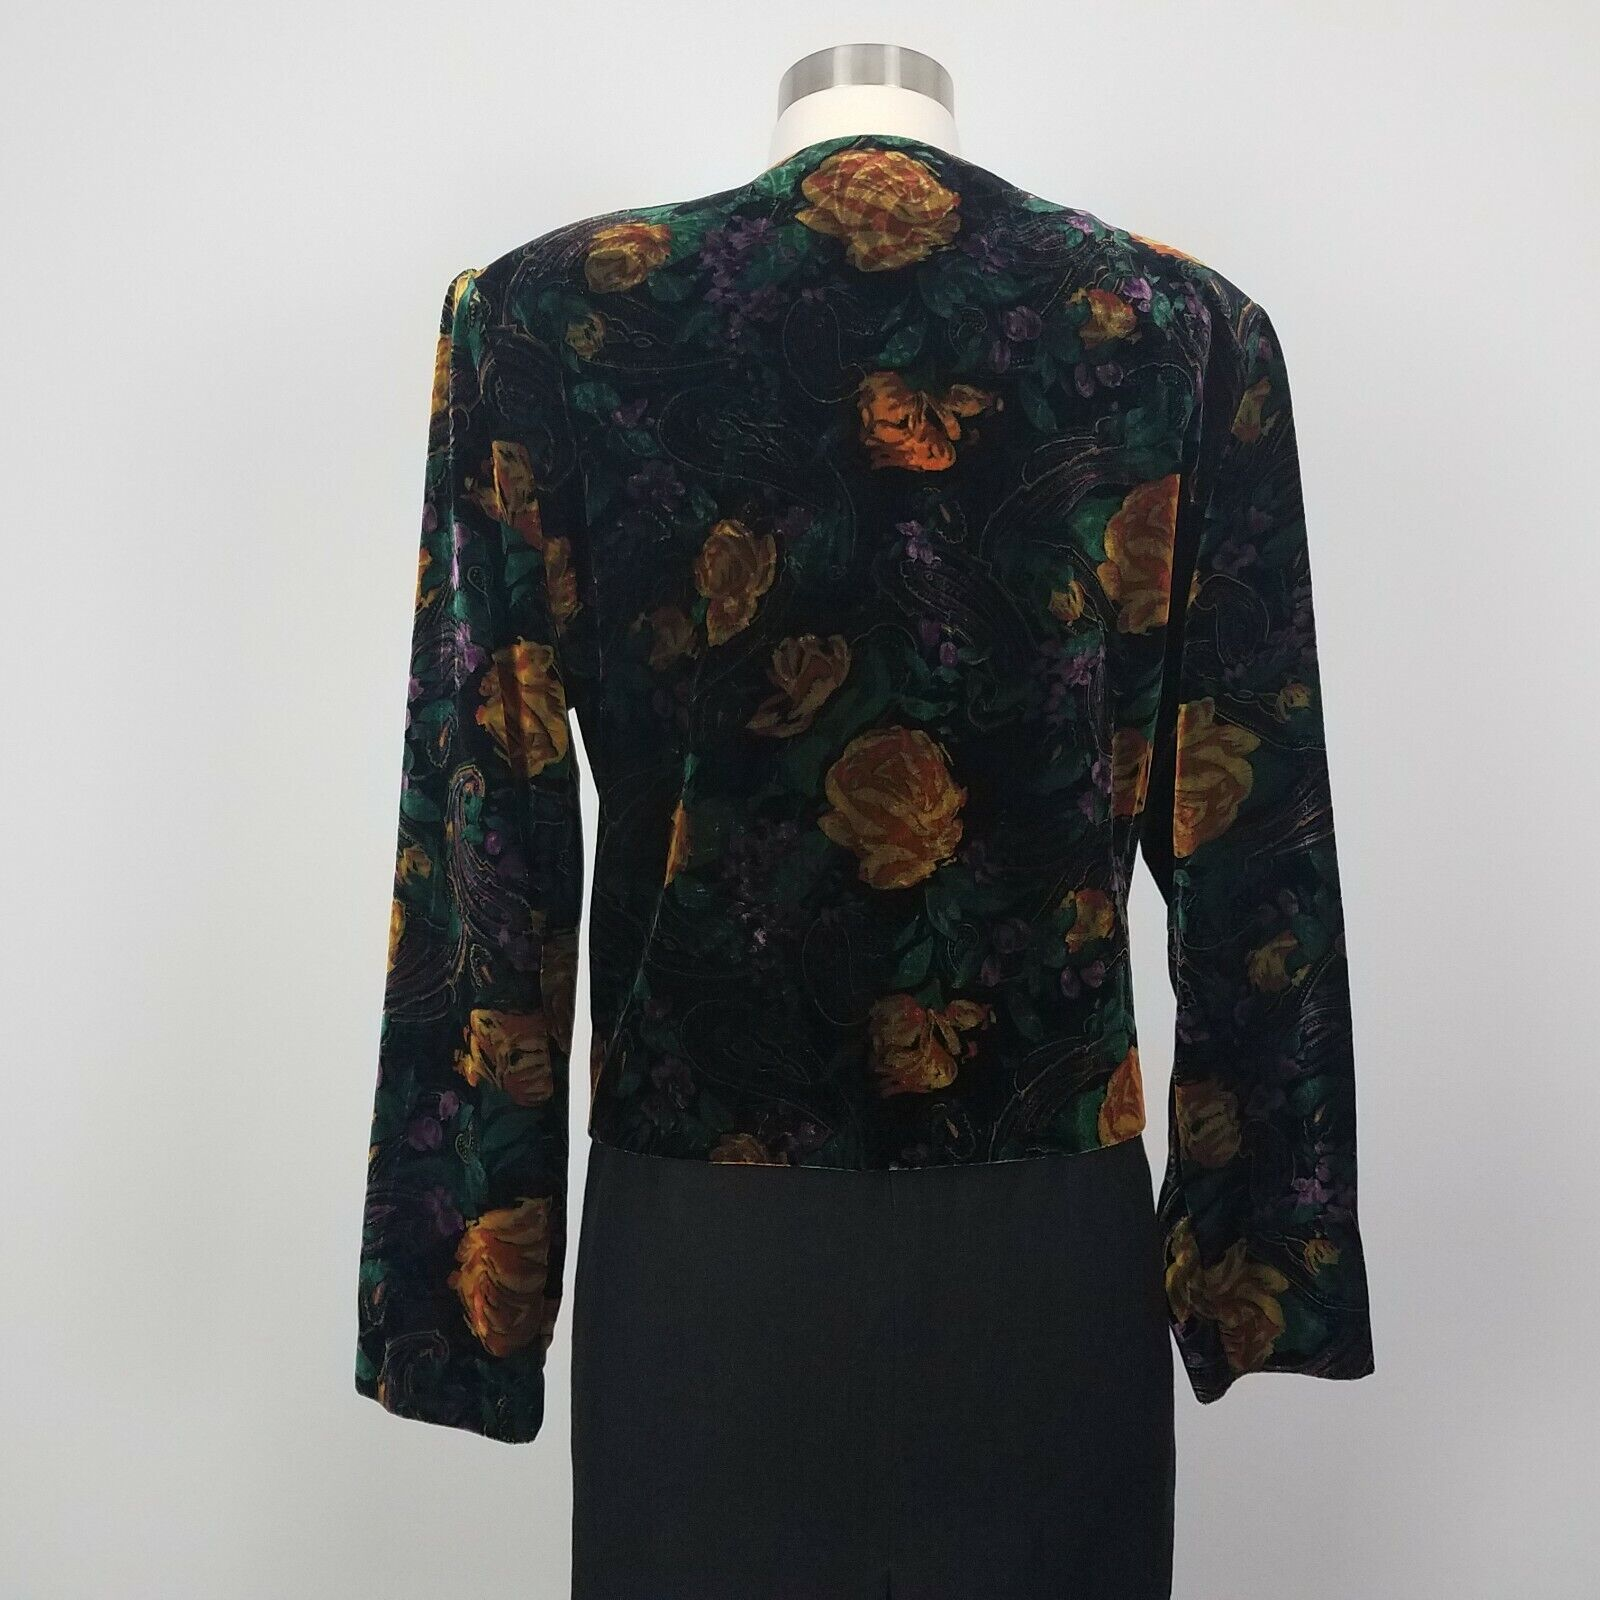 Vintage 80s Metallic Patchwork Print Cropped Velvet Blazer M Gold Brown Paisley